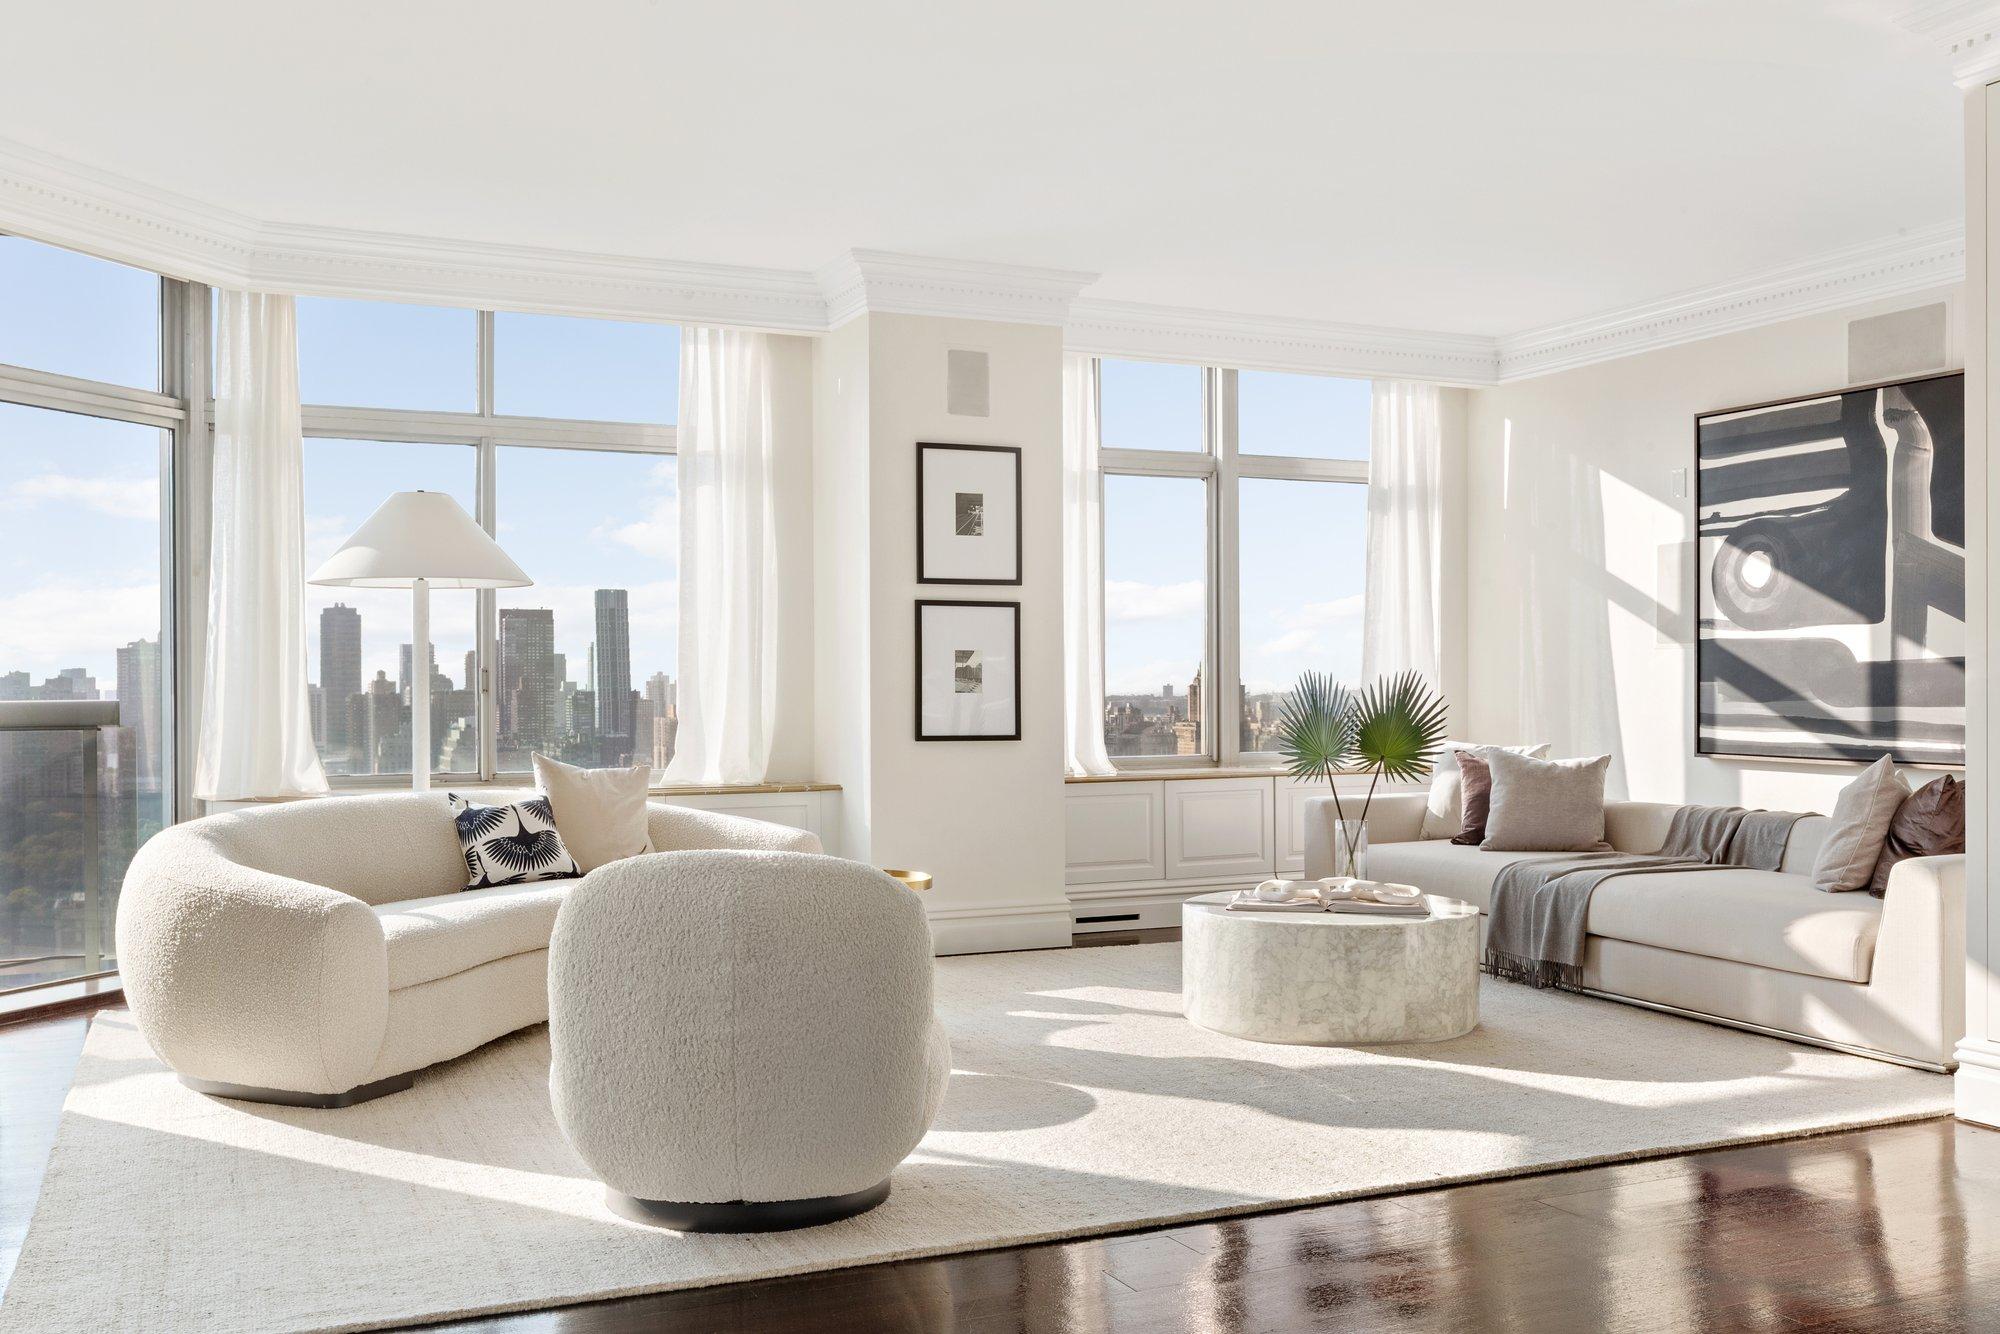 Condo in New York, New York, United States 1 - 11612366